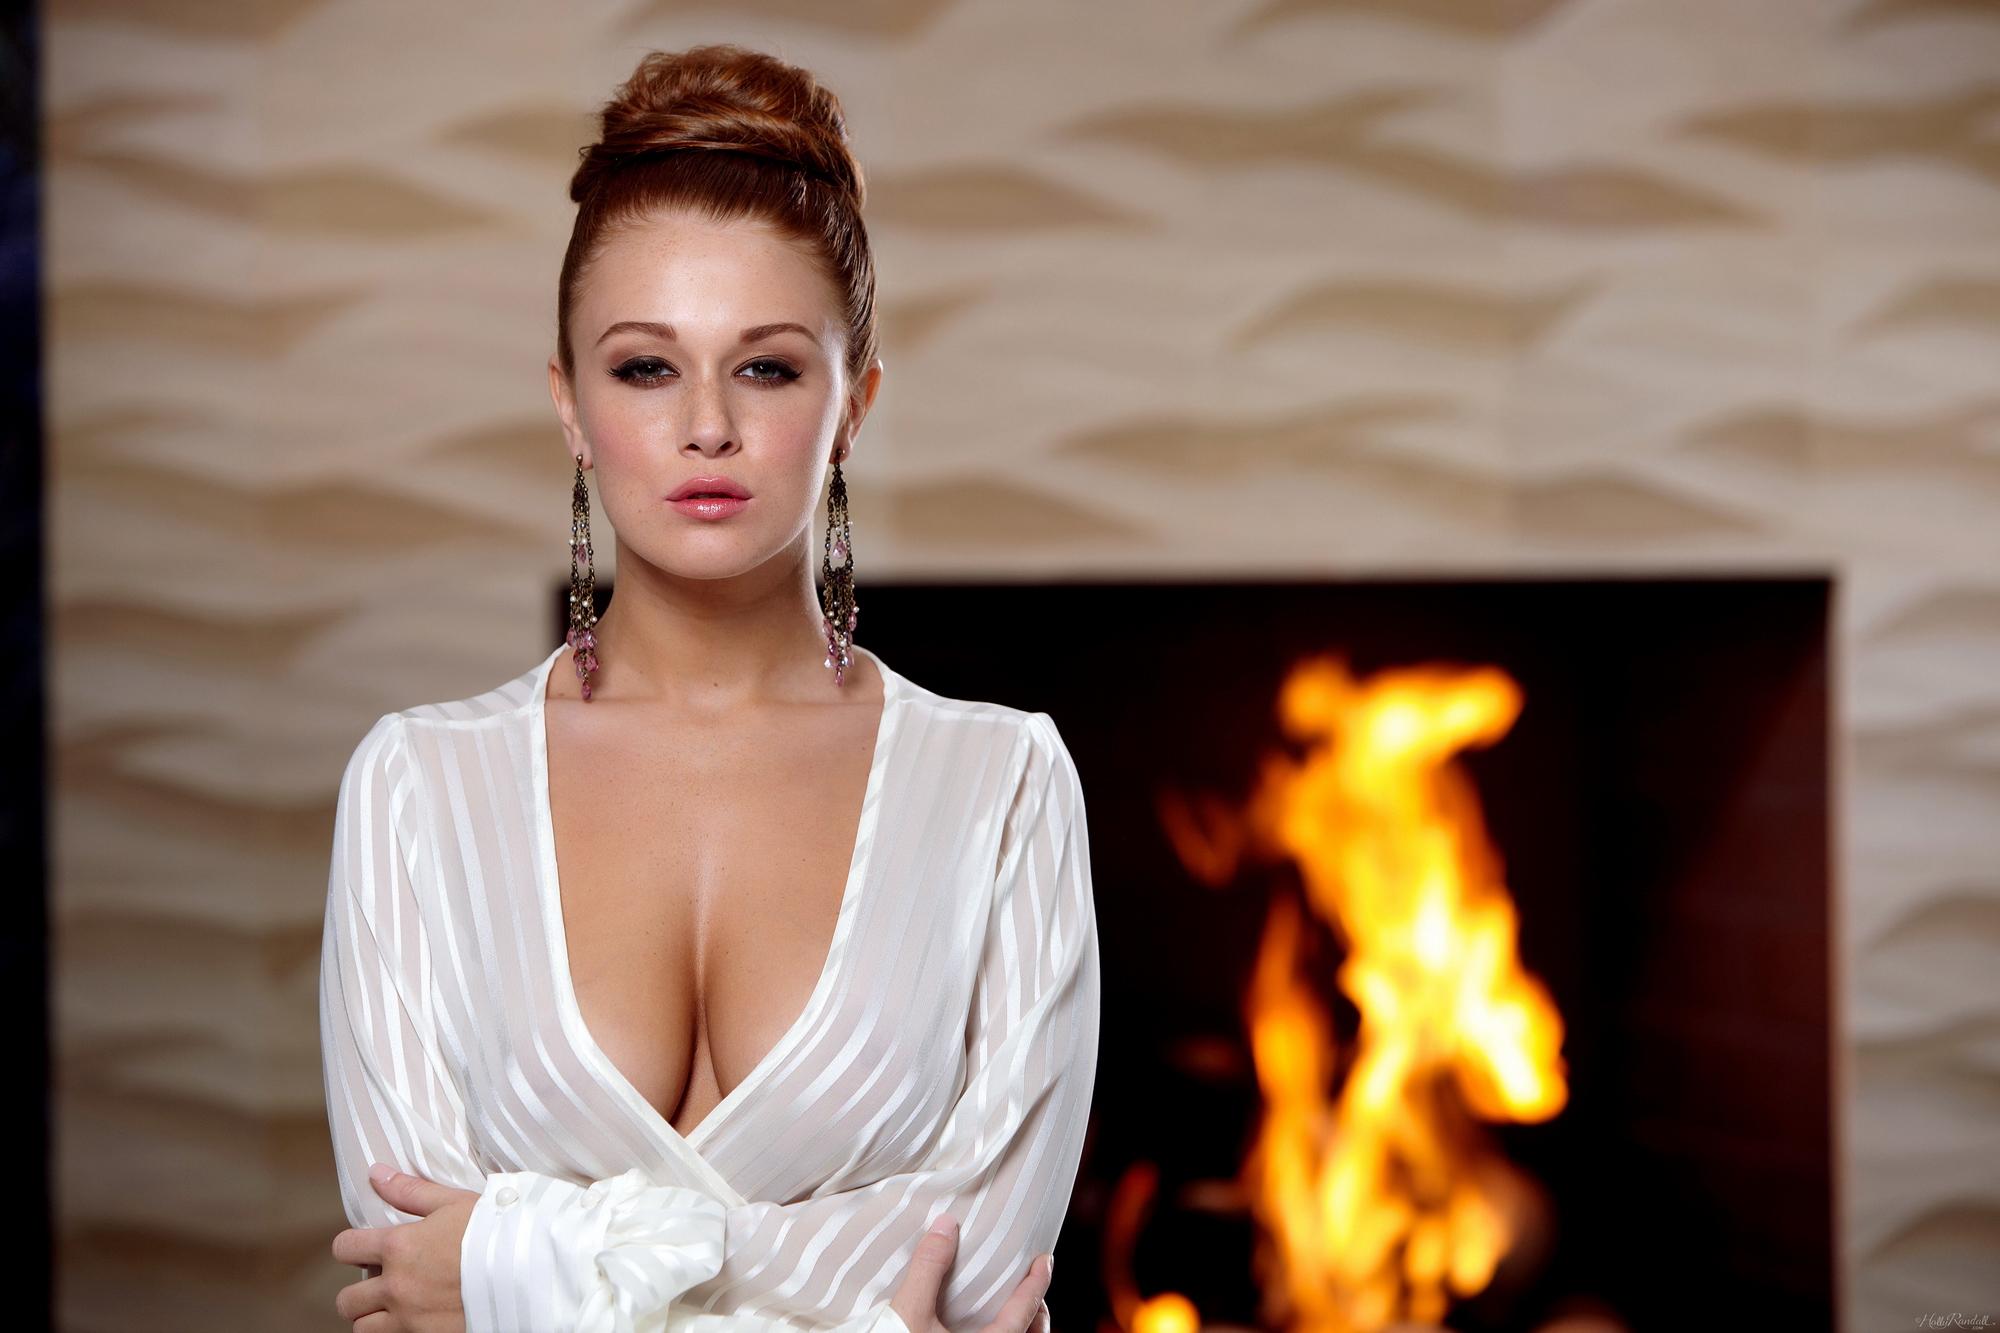 leanna-decker-nude-fireplace-redhead-hollyrandall-01